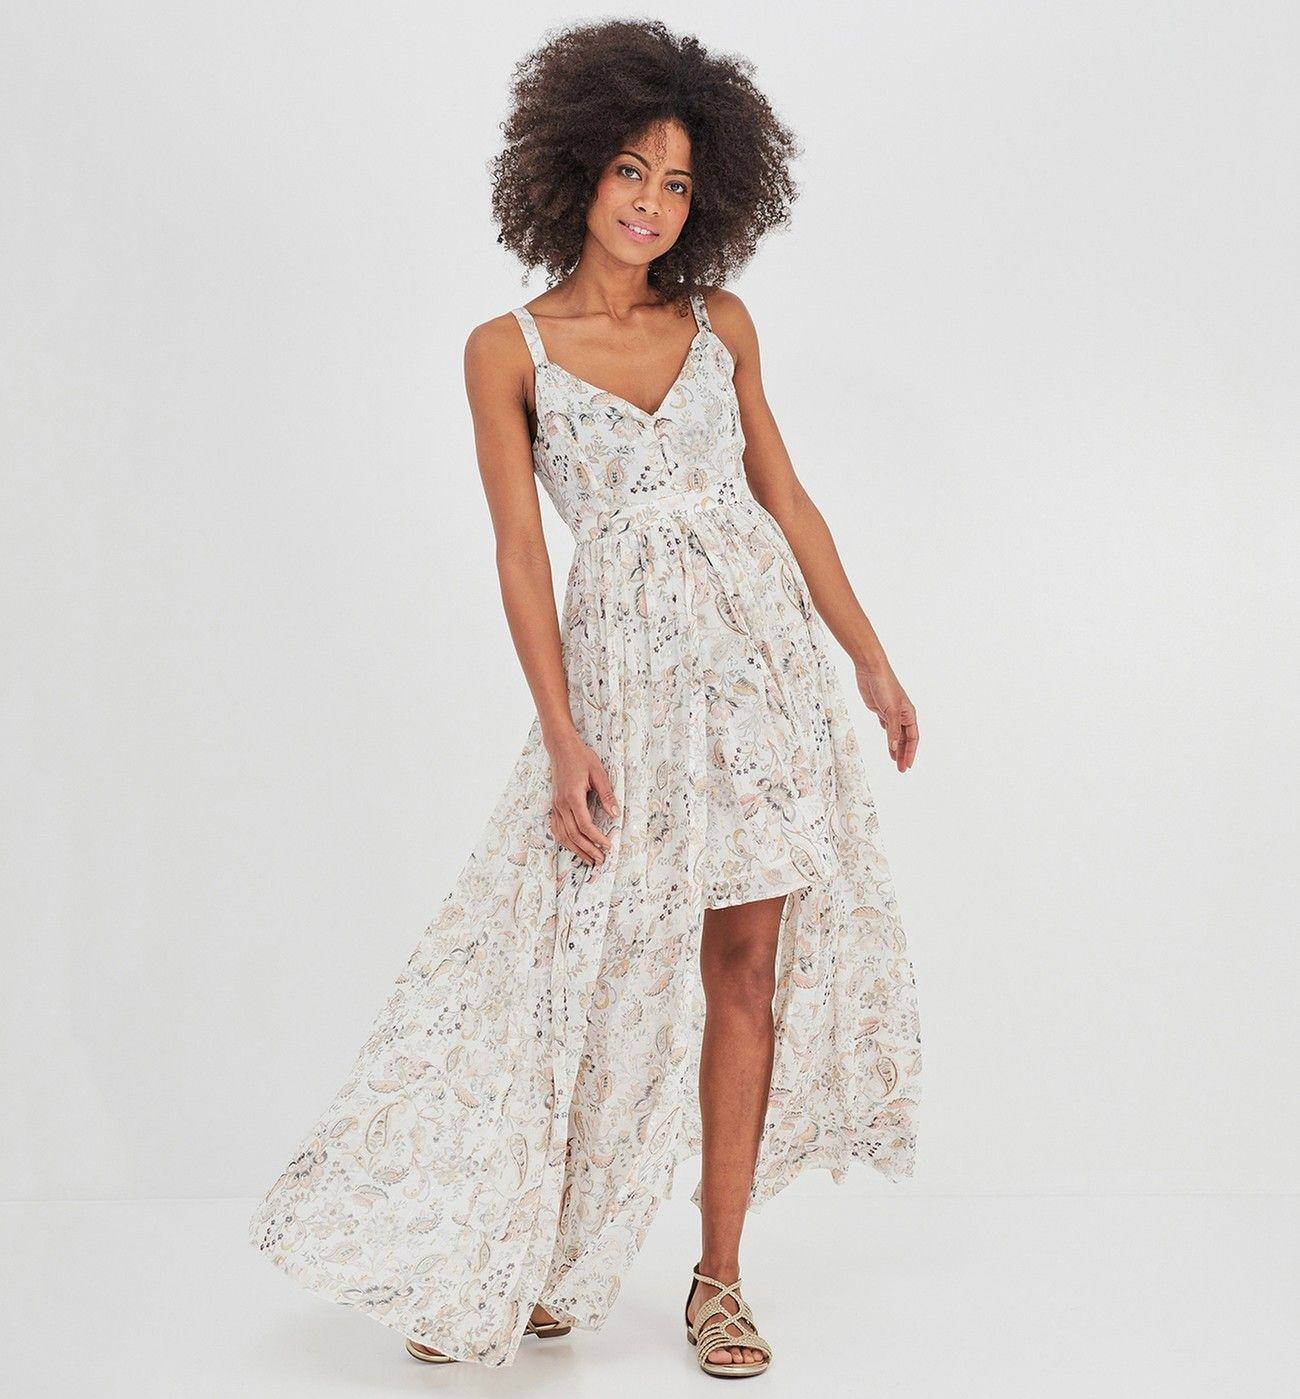 Epingle Sur Mode Fashion